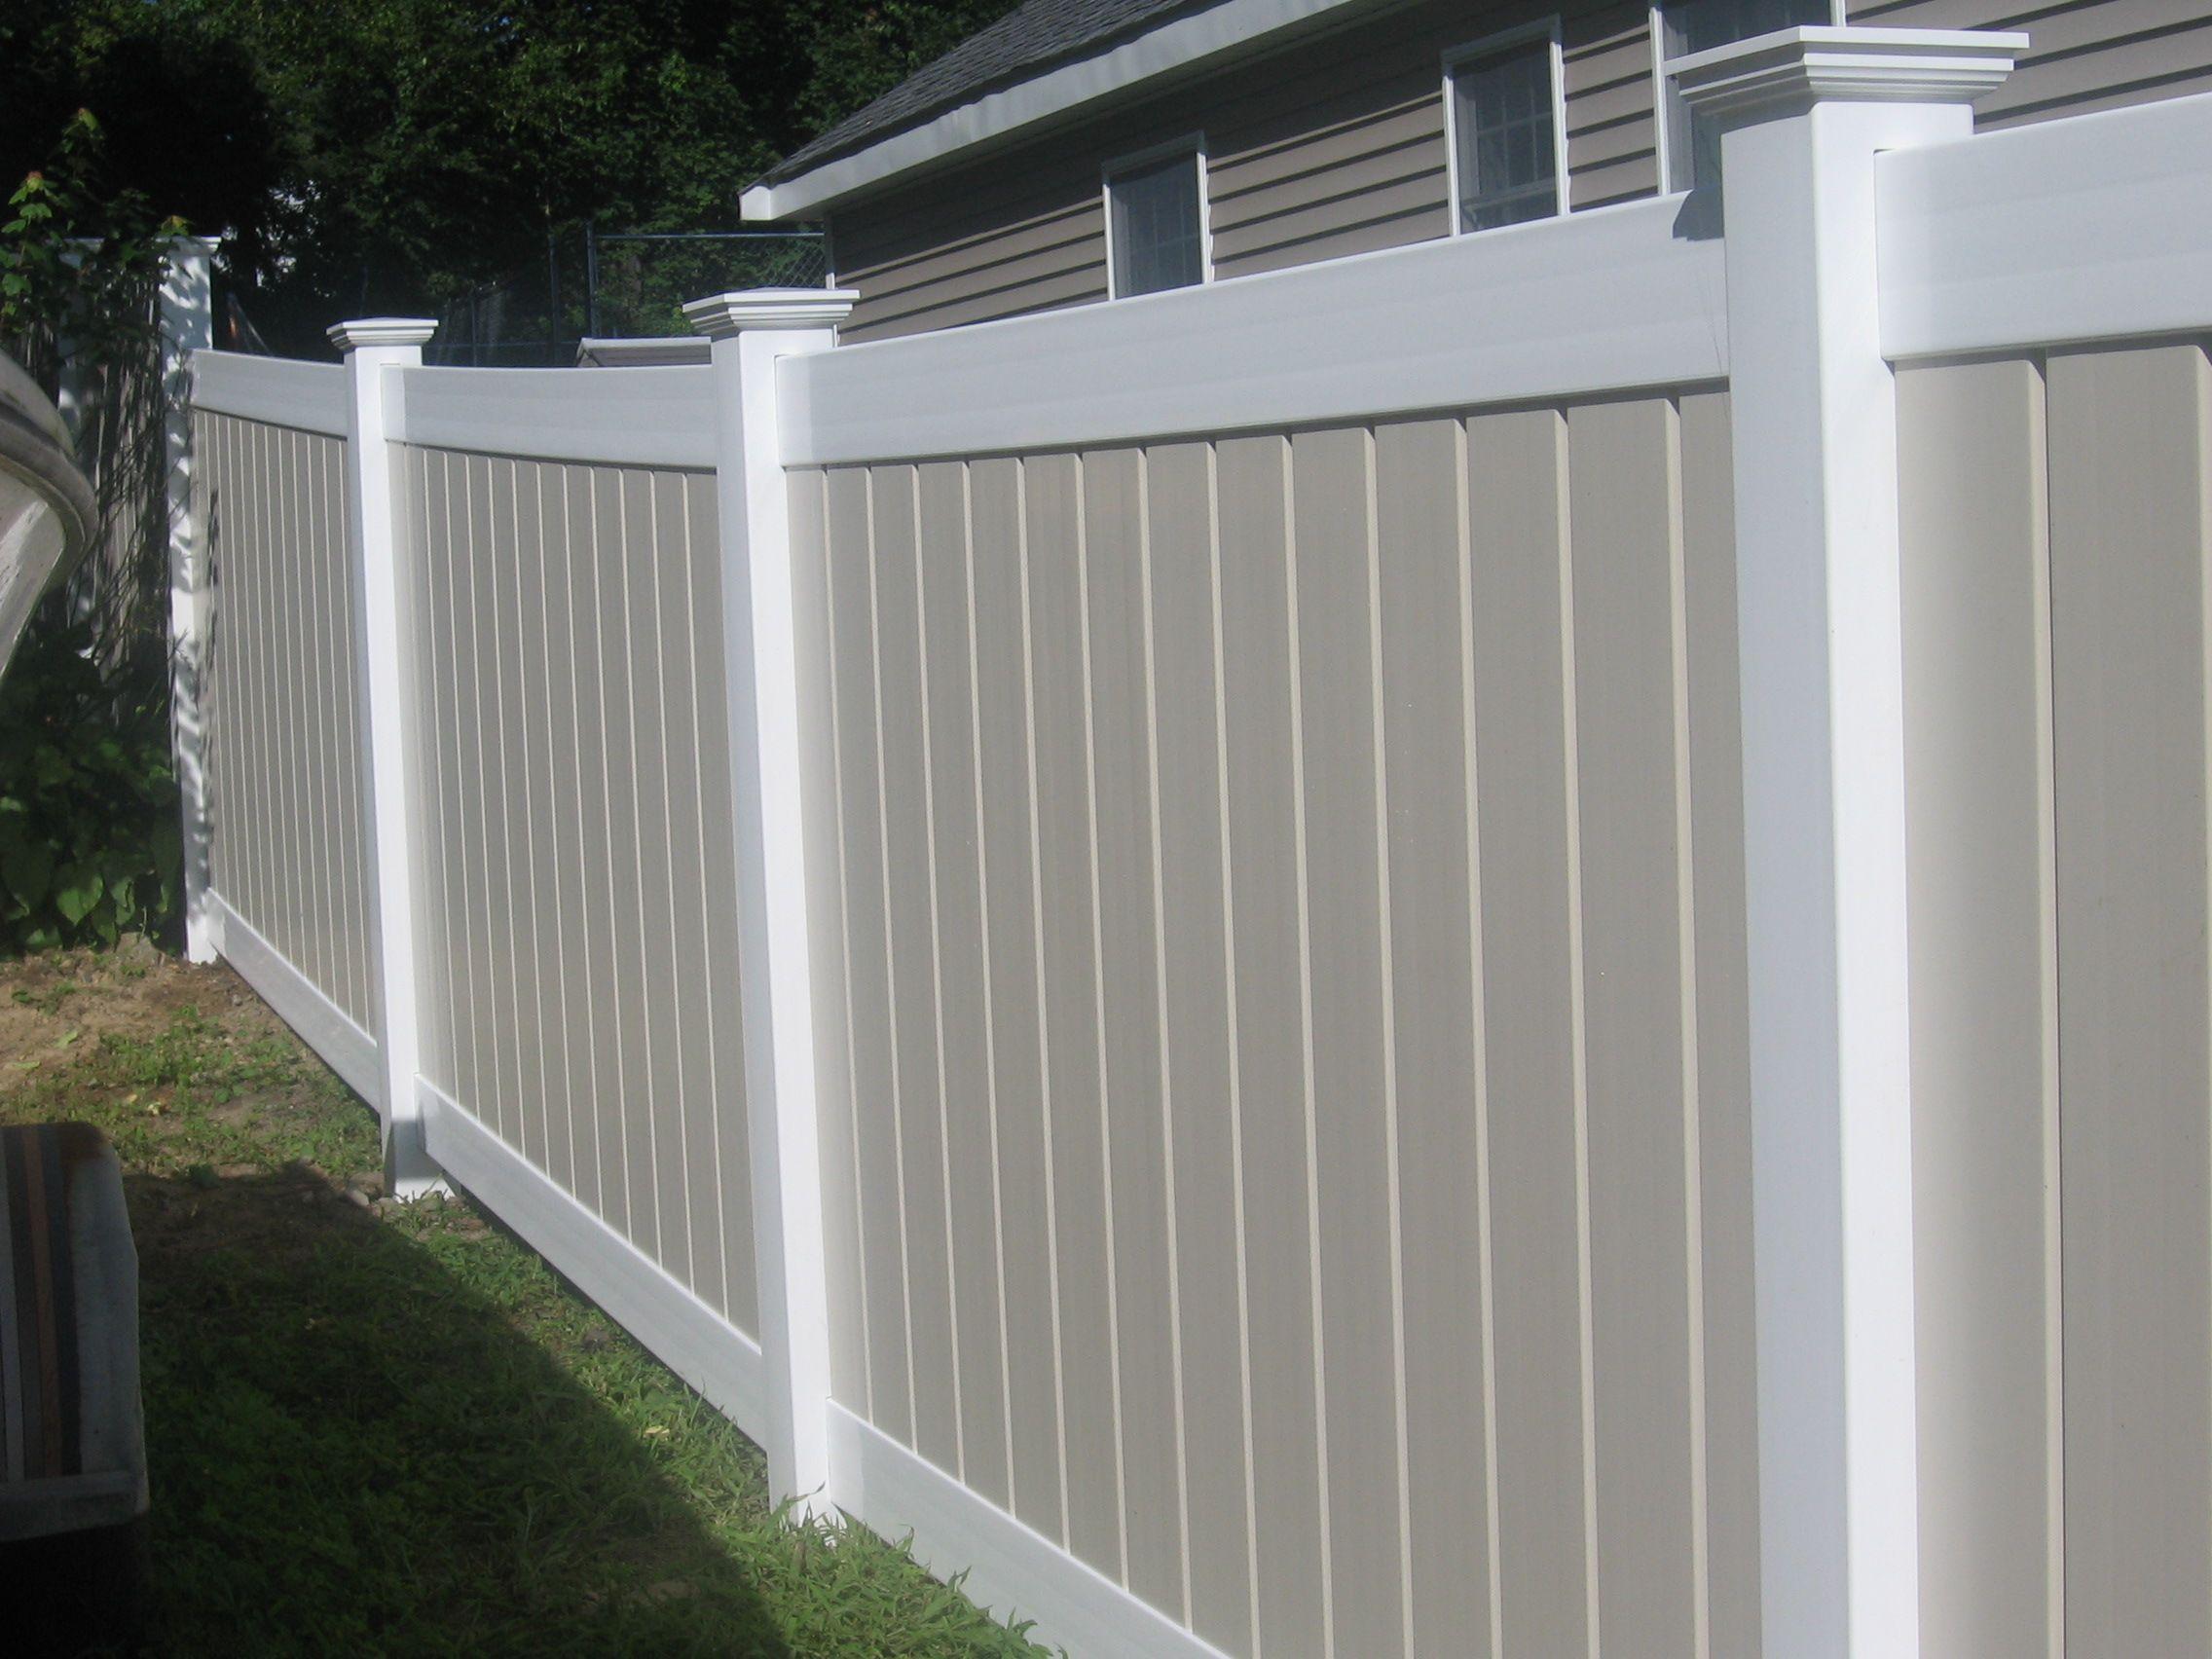 Vinyl Fence In Peabody Ma 01902 Vinyl Fence Panels Vinyl Fence Cost Vinyl Fence